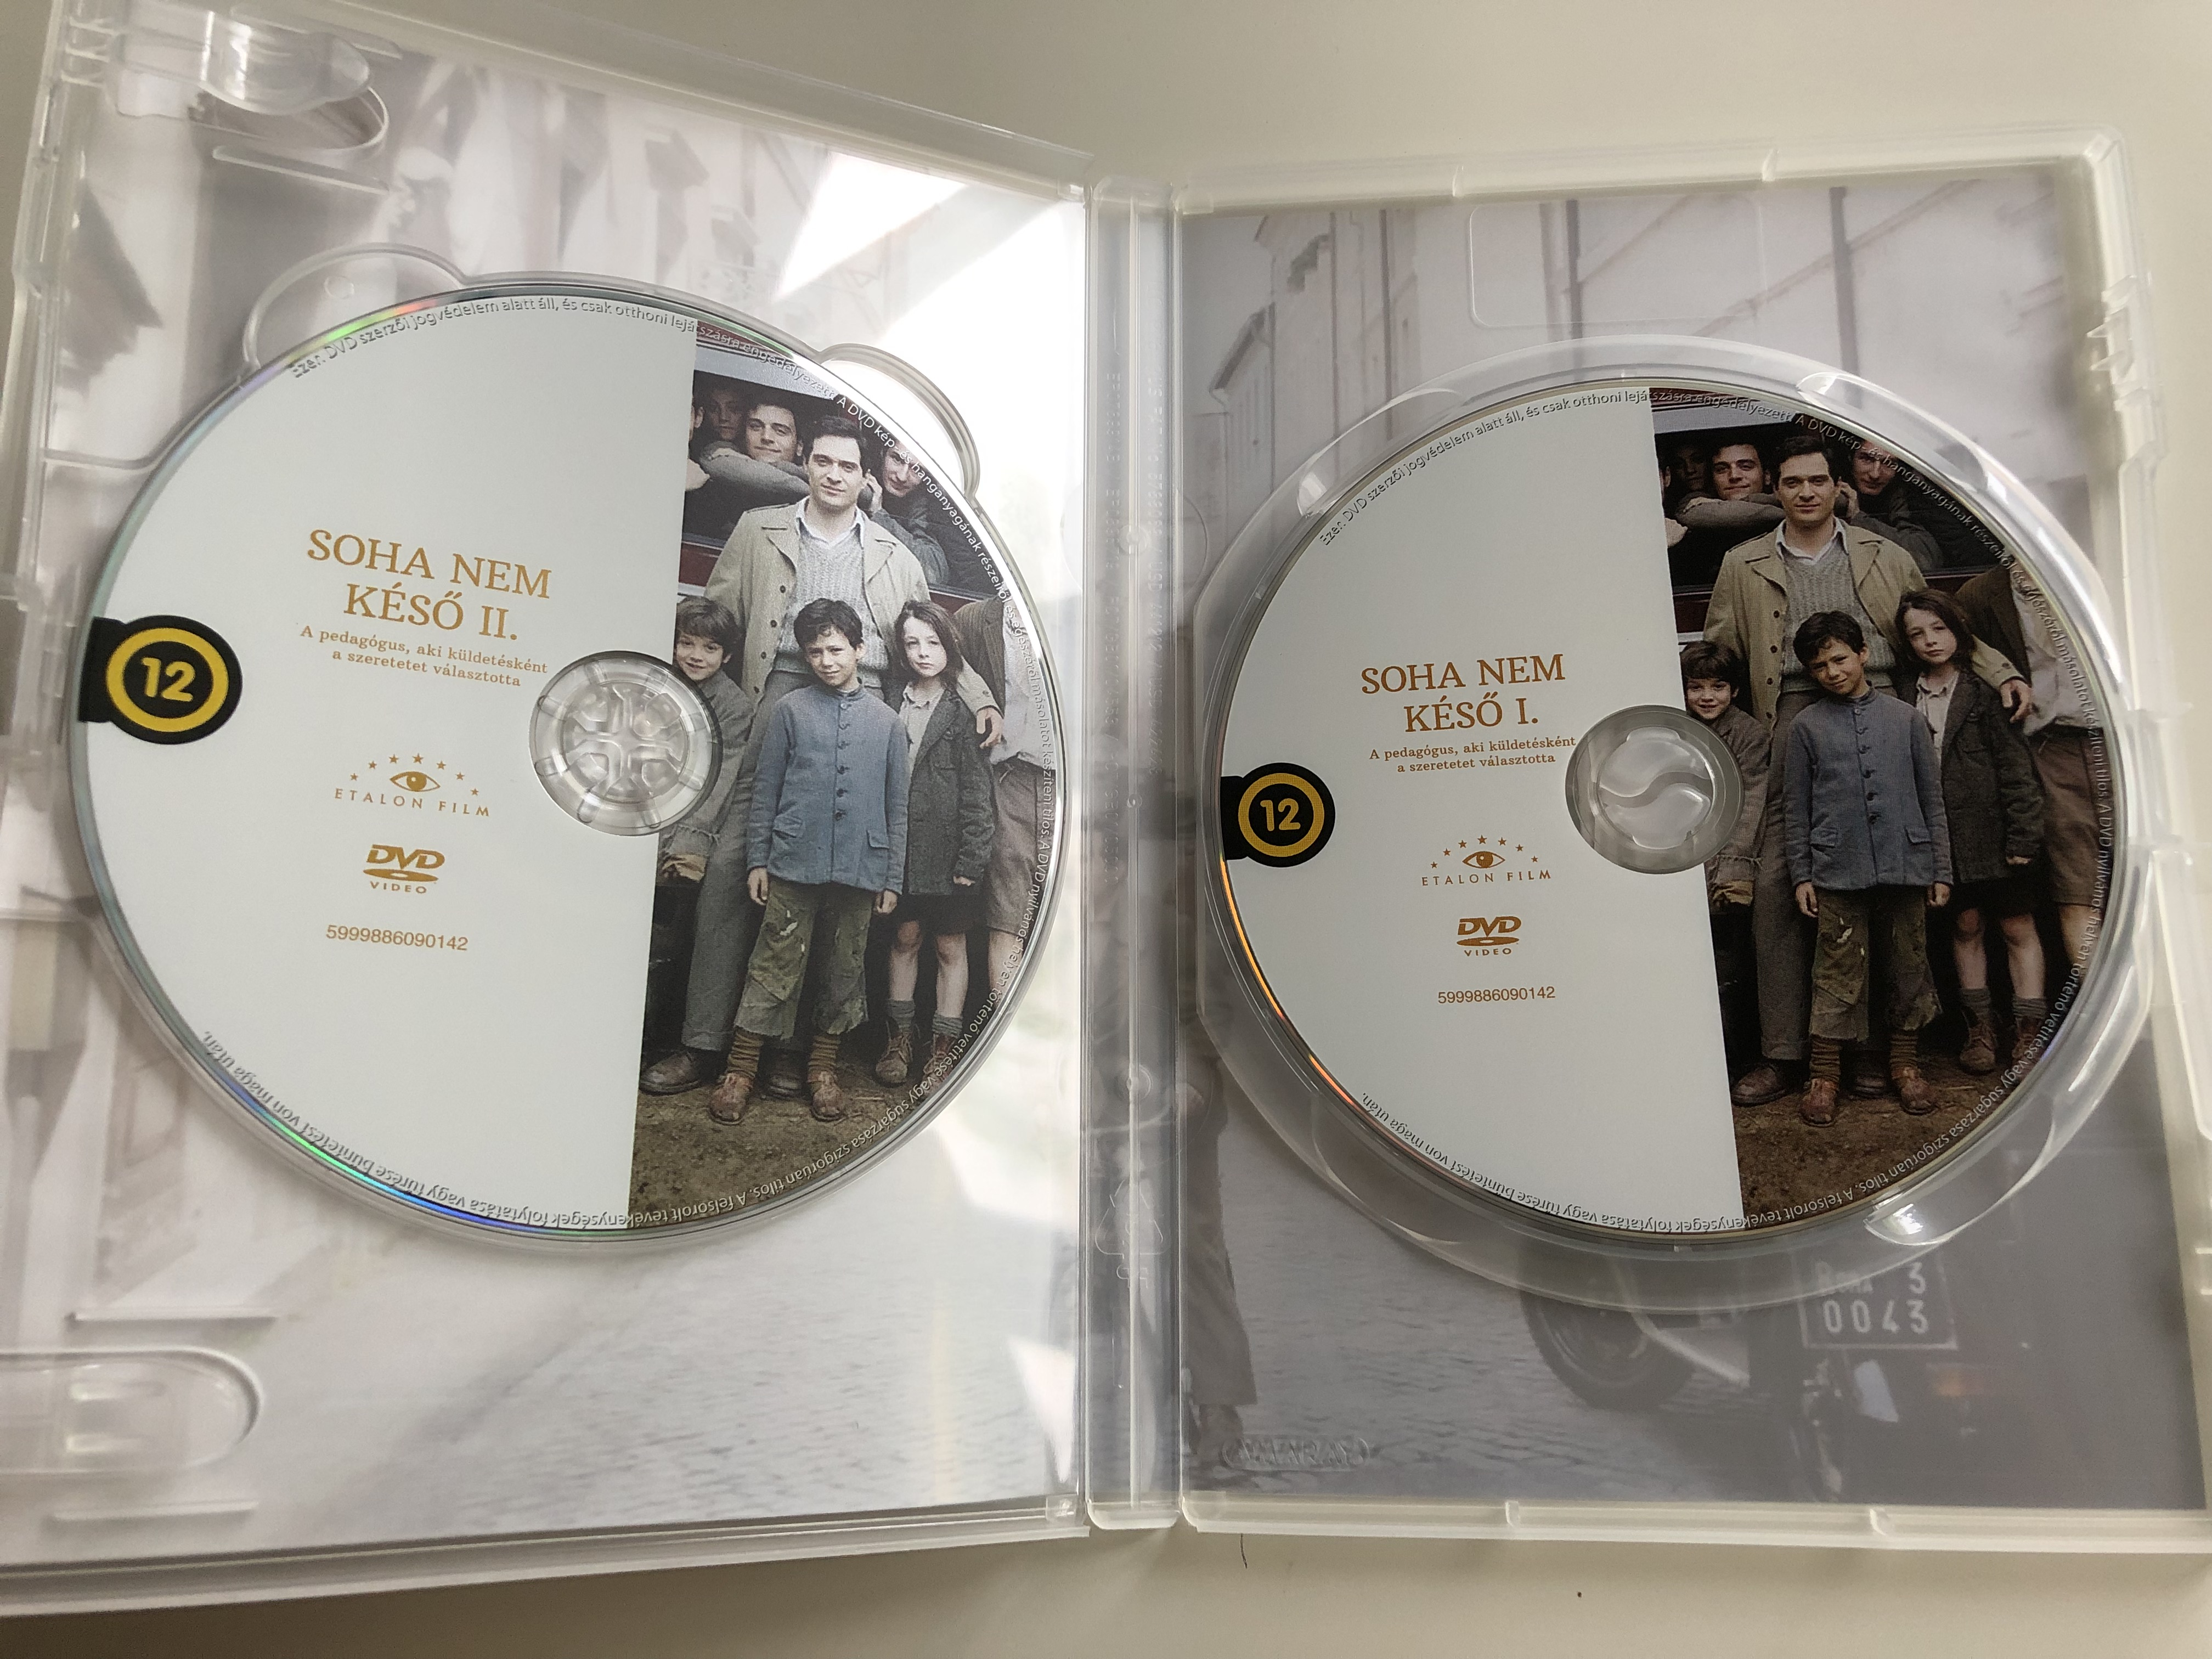 non-mai-troppo-tarti-i-ii.-dvd-2014-soha-nem-k-s-i-ii.-directed-by-giacomo-campiotti-starring-claudio-santamaria-nicole-grimaudo-gennaro-mirto-lucio-mscino-alberto-molinari-2-.jpg